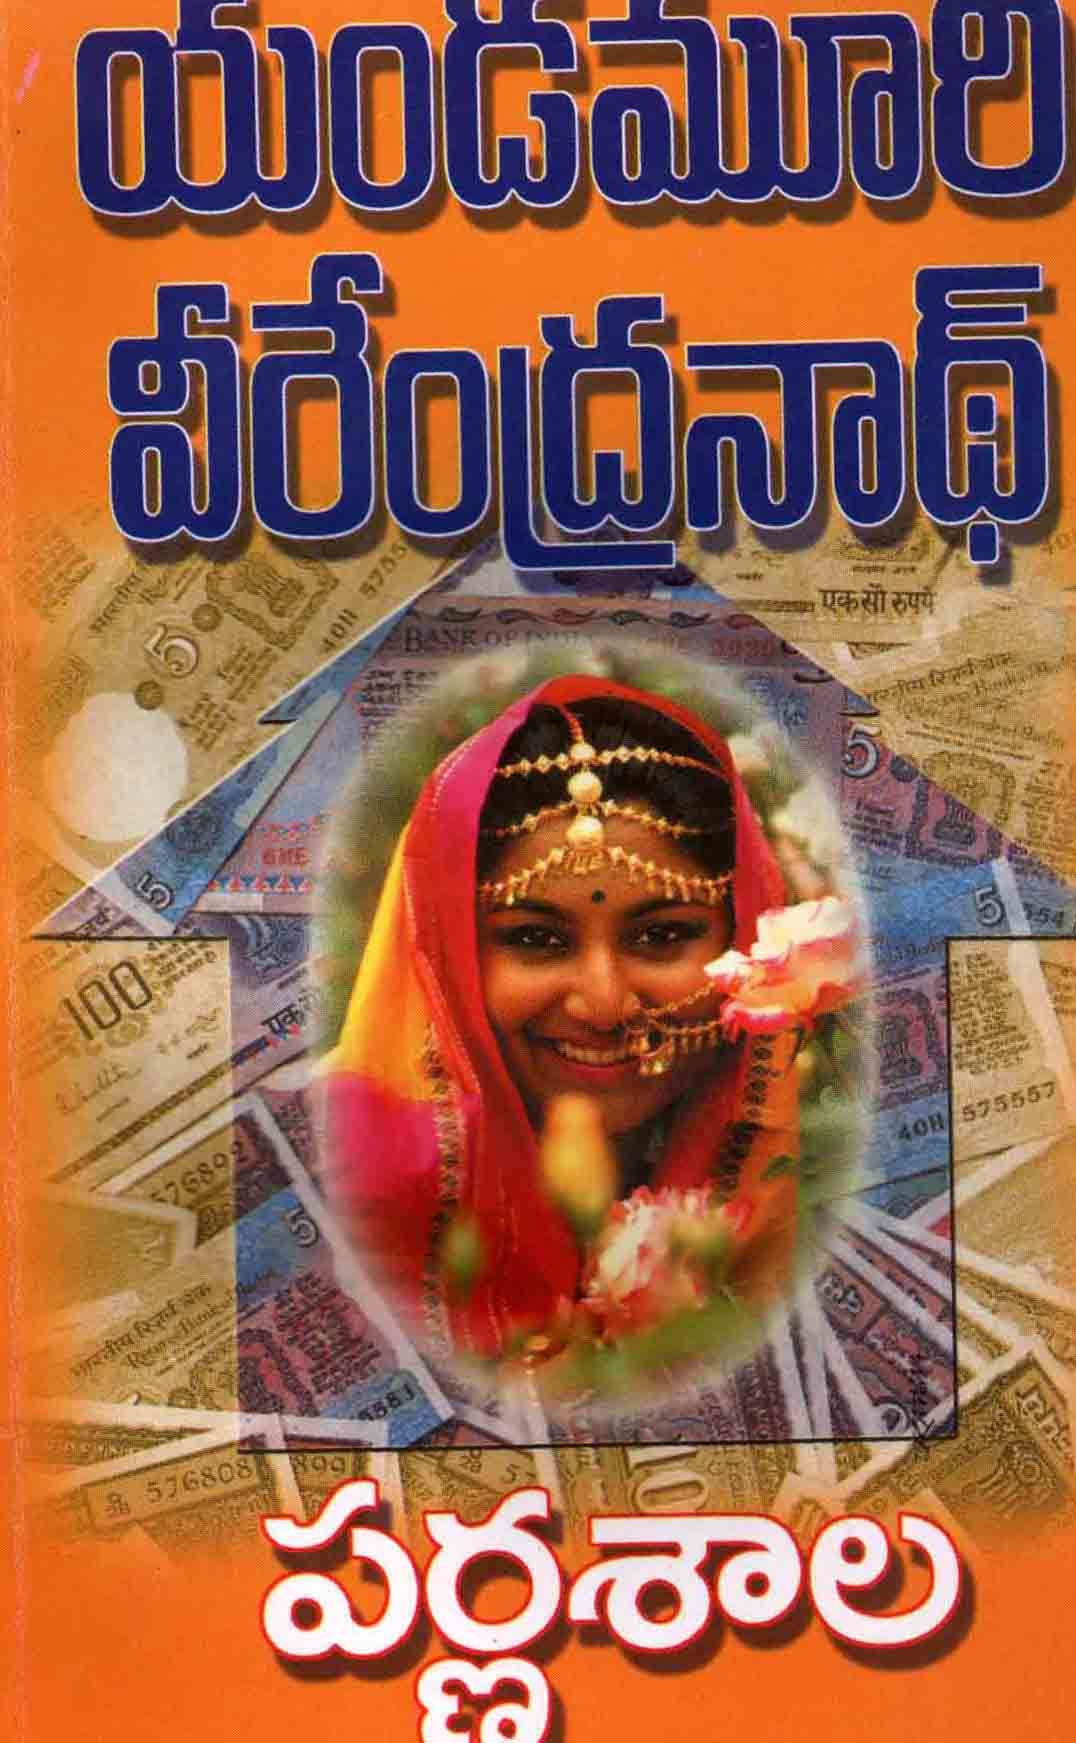 TeluguOne Grandhalayam Novels to read online, Novels